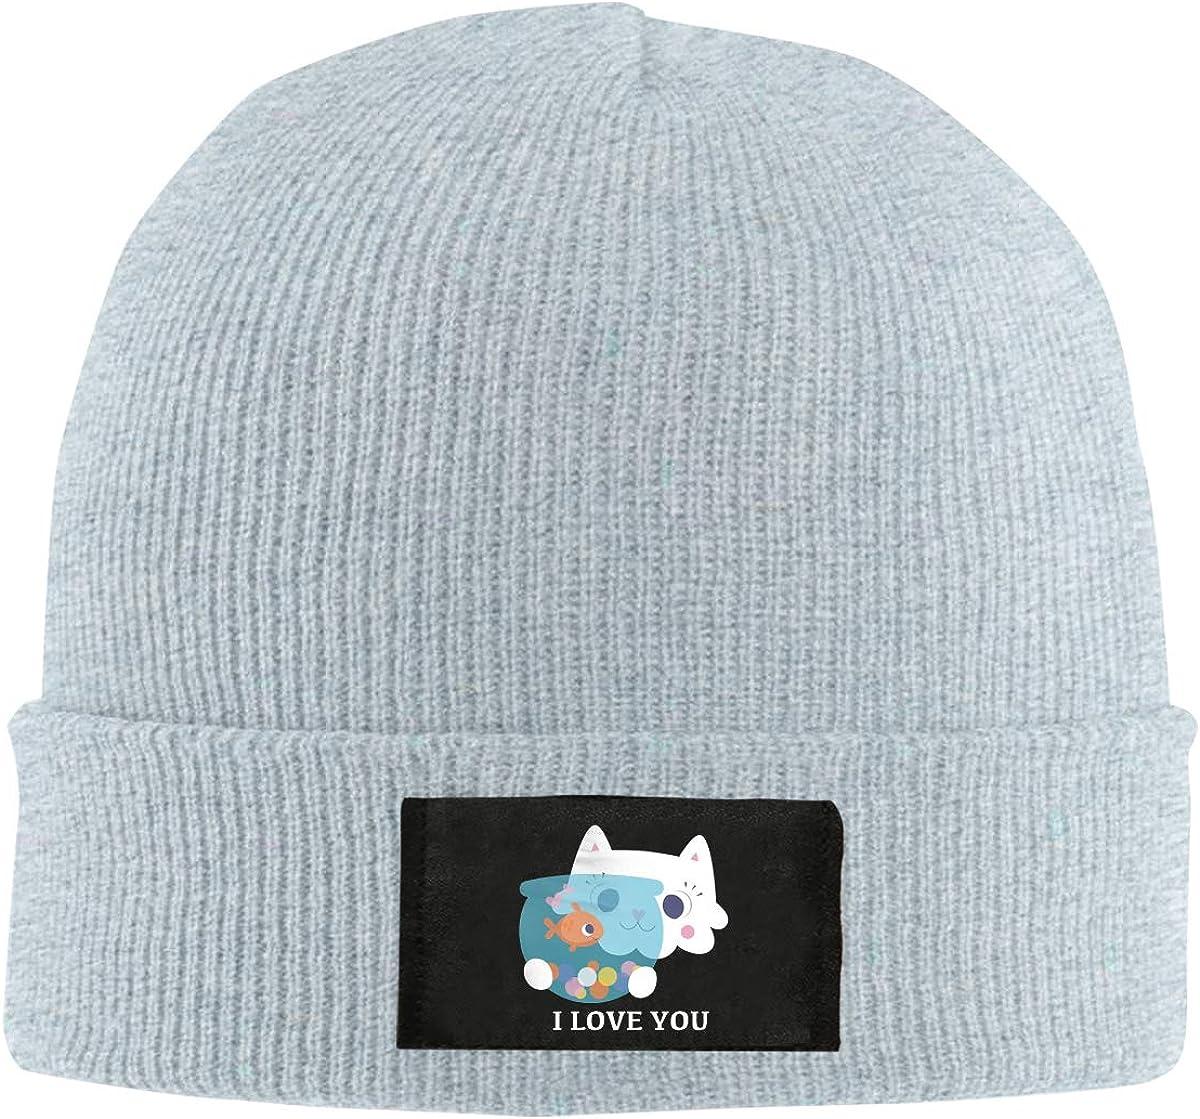 I Love You Cat Kiss Fish Winter Beanie Hat Knit Skull Cap for Men /& Women